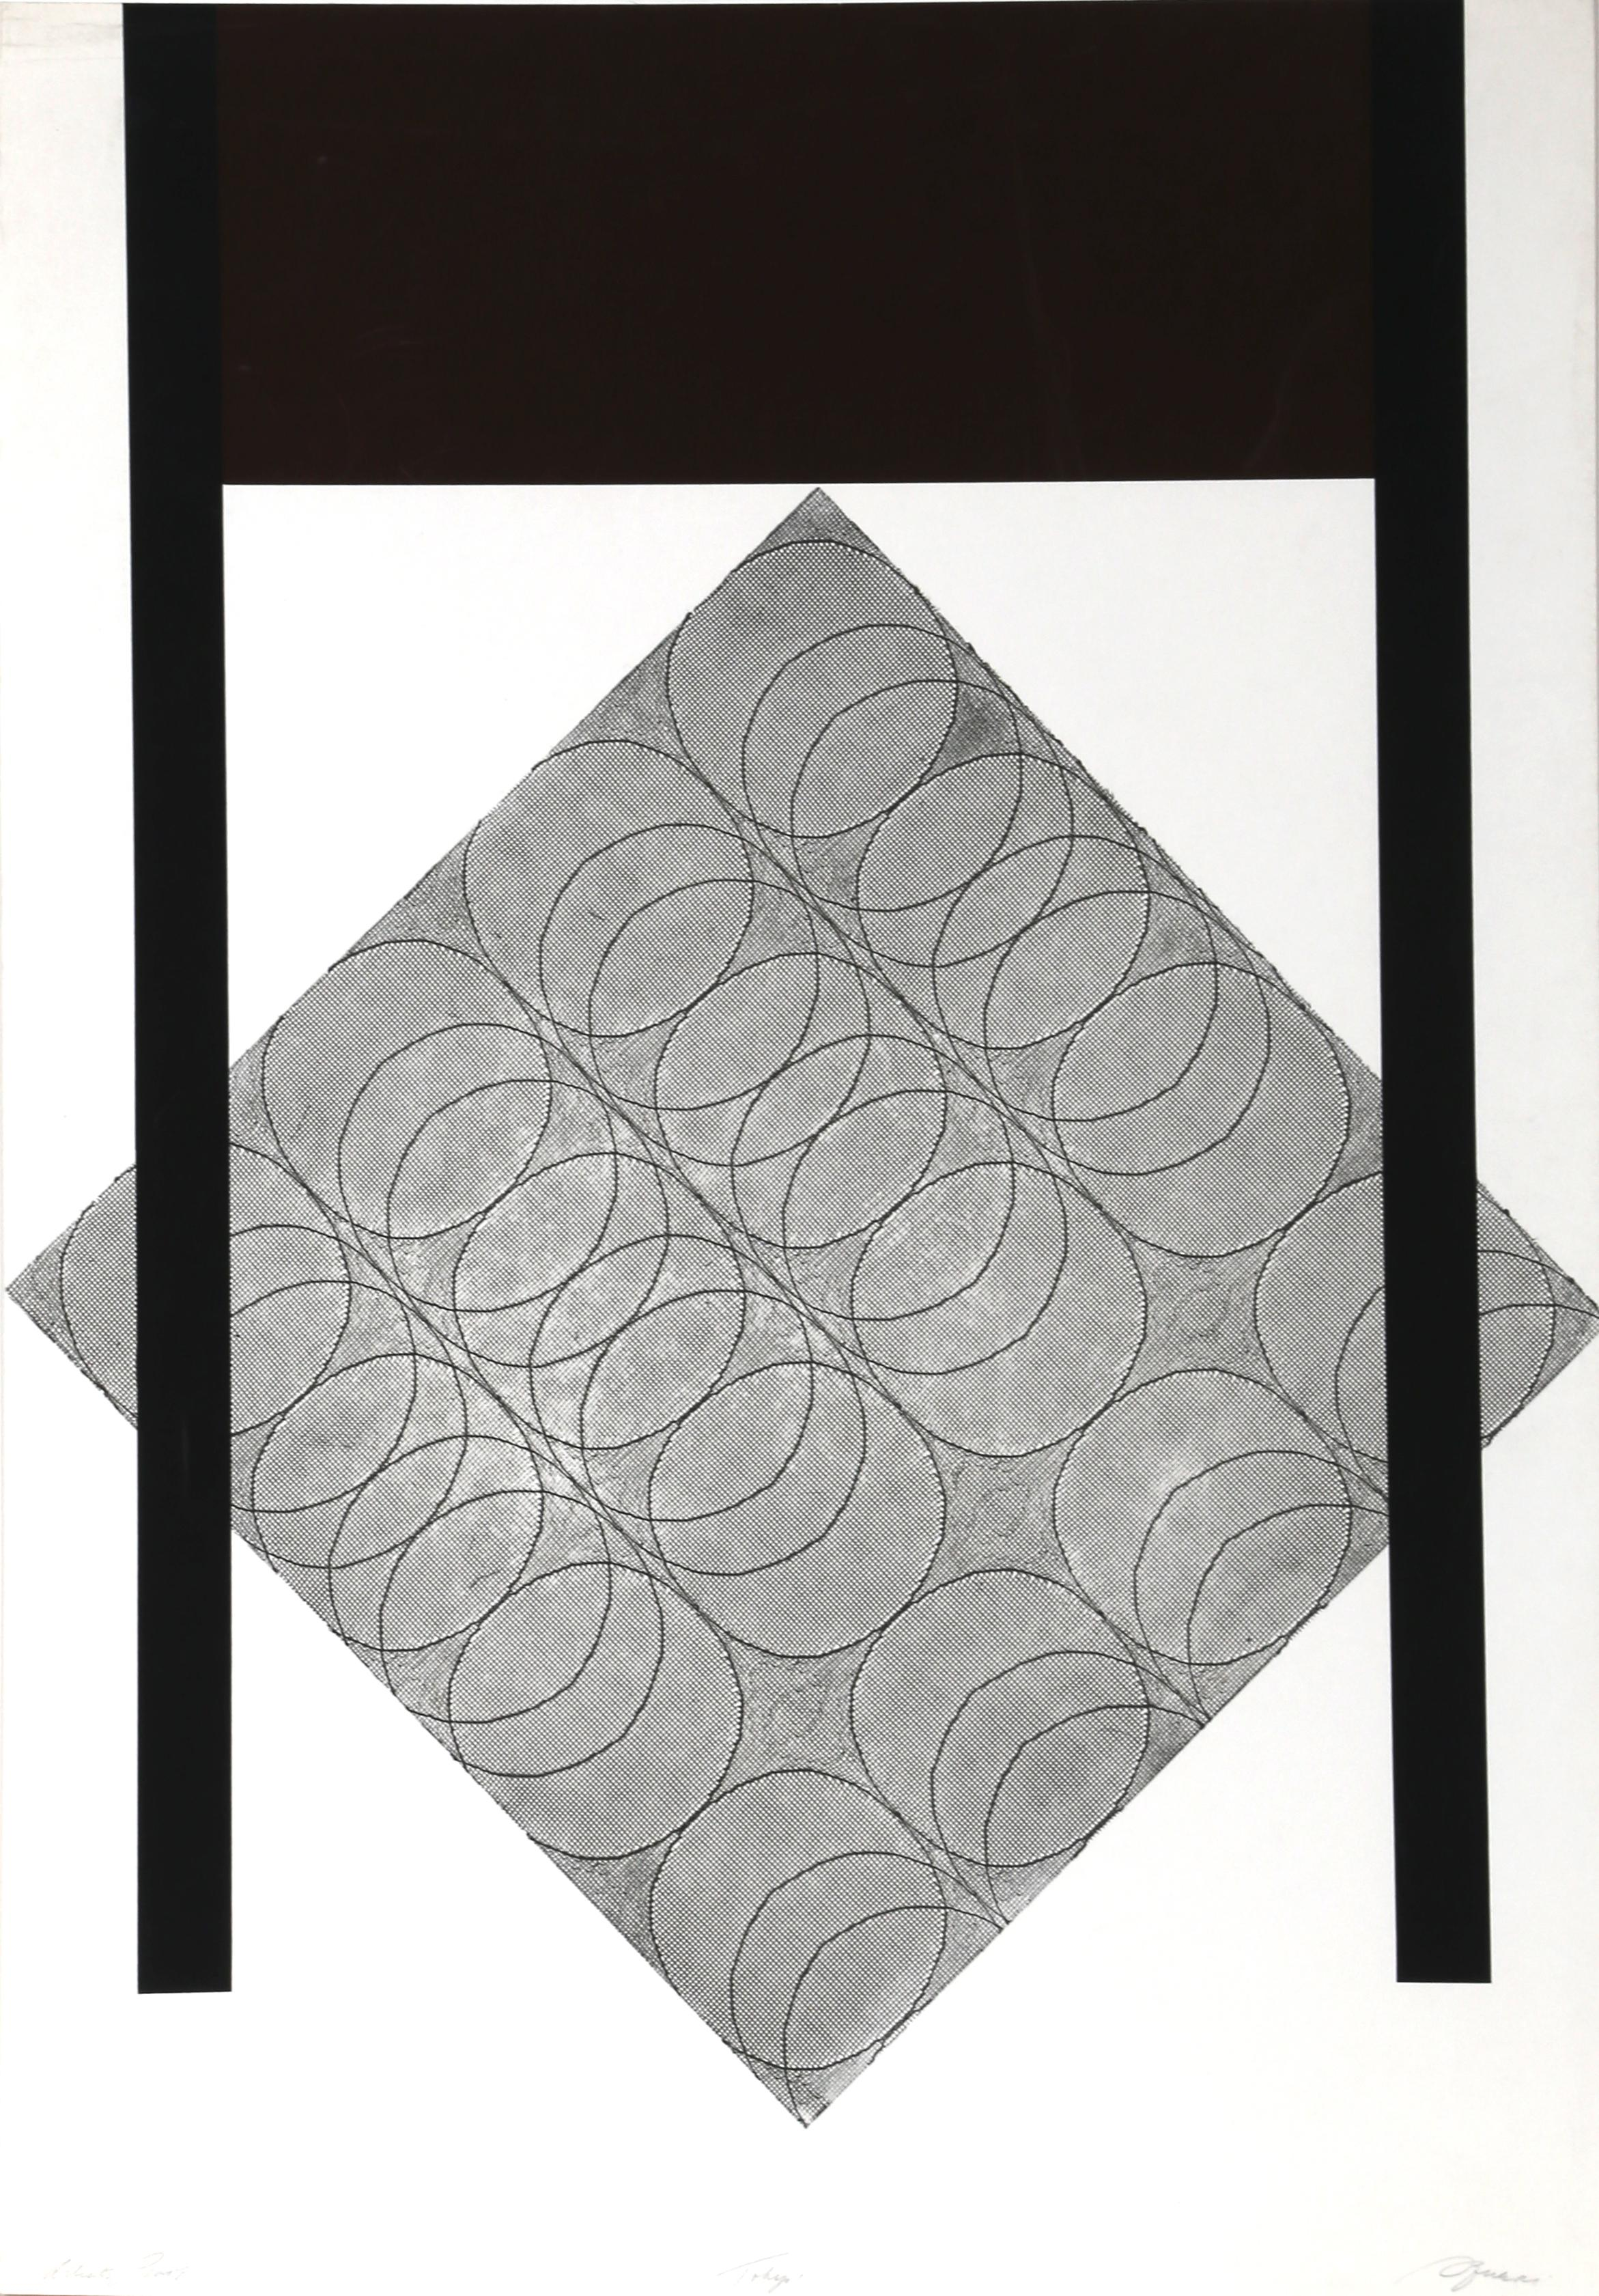 Tokyo 2, Geometric Silkscreen by Robert Squeri